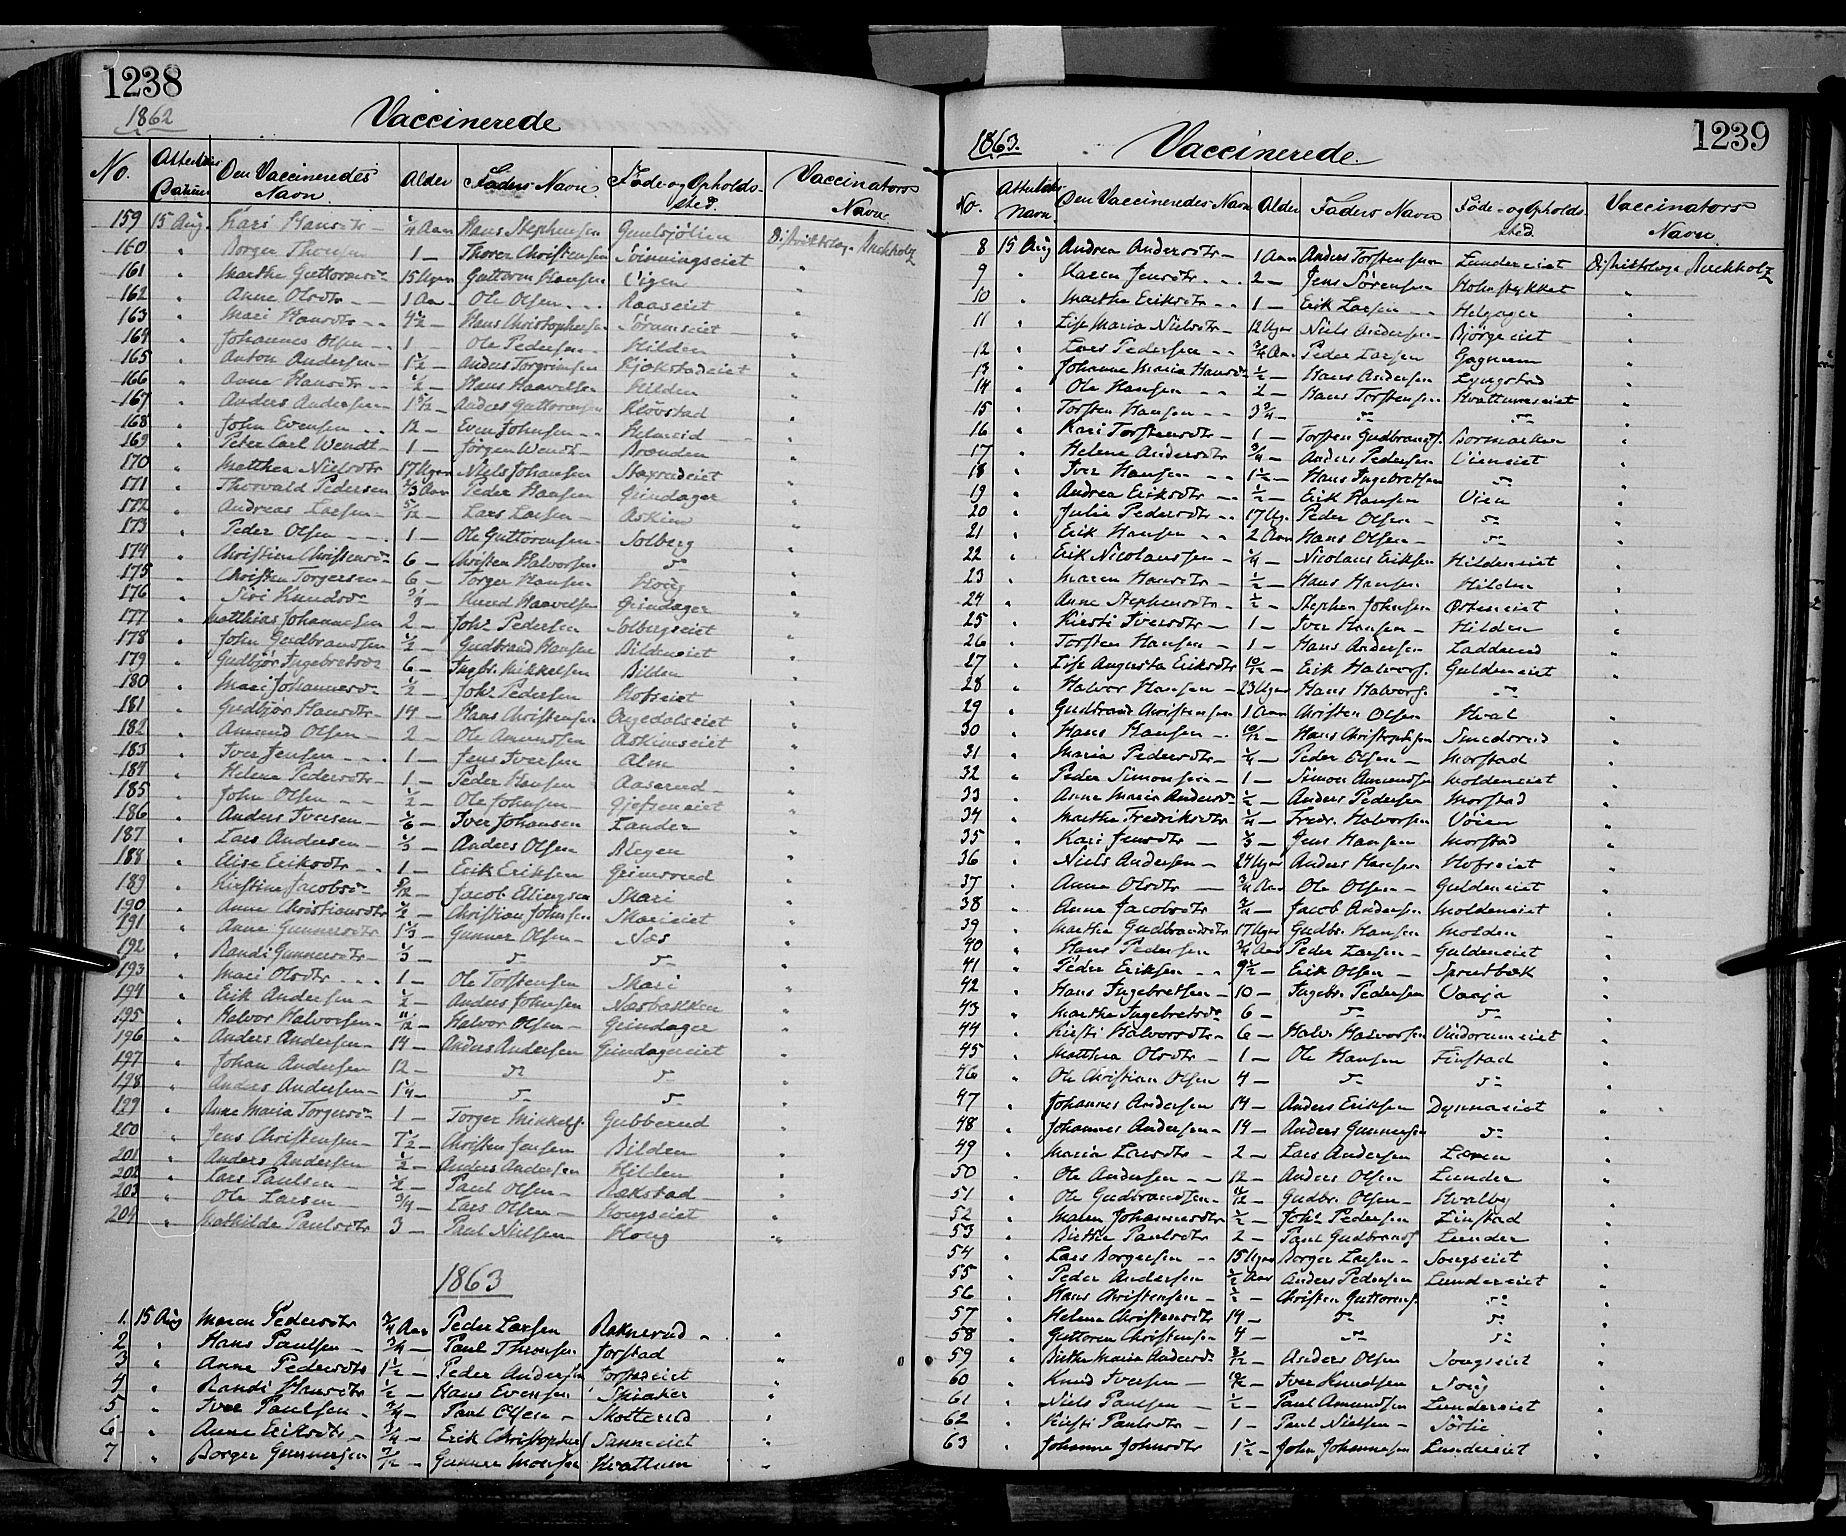 SAH, Gran prestekontor, Ministerialbok nr. 12, 1856-1874, s. 1238-1239